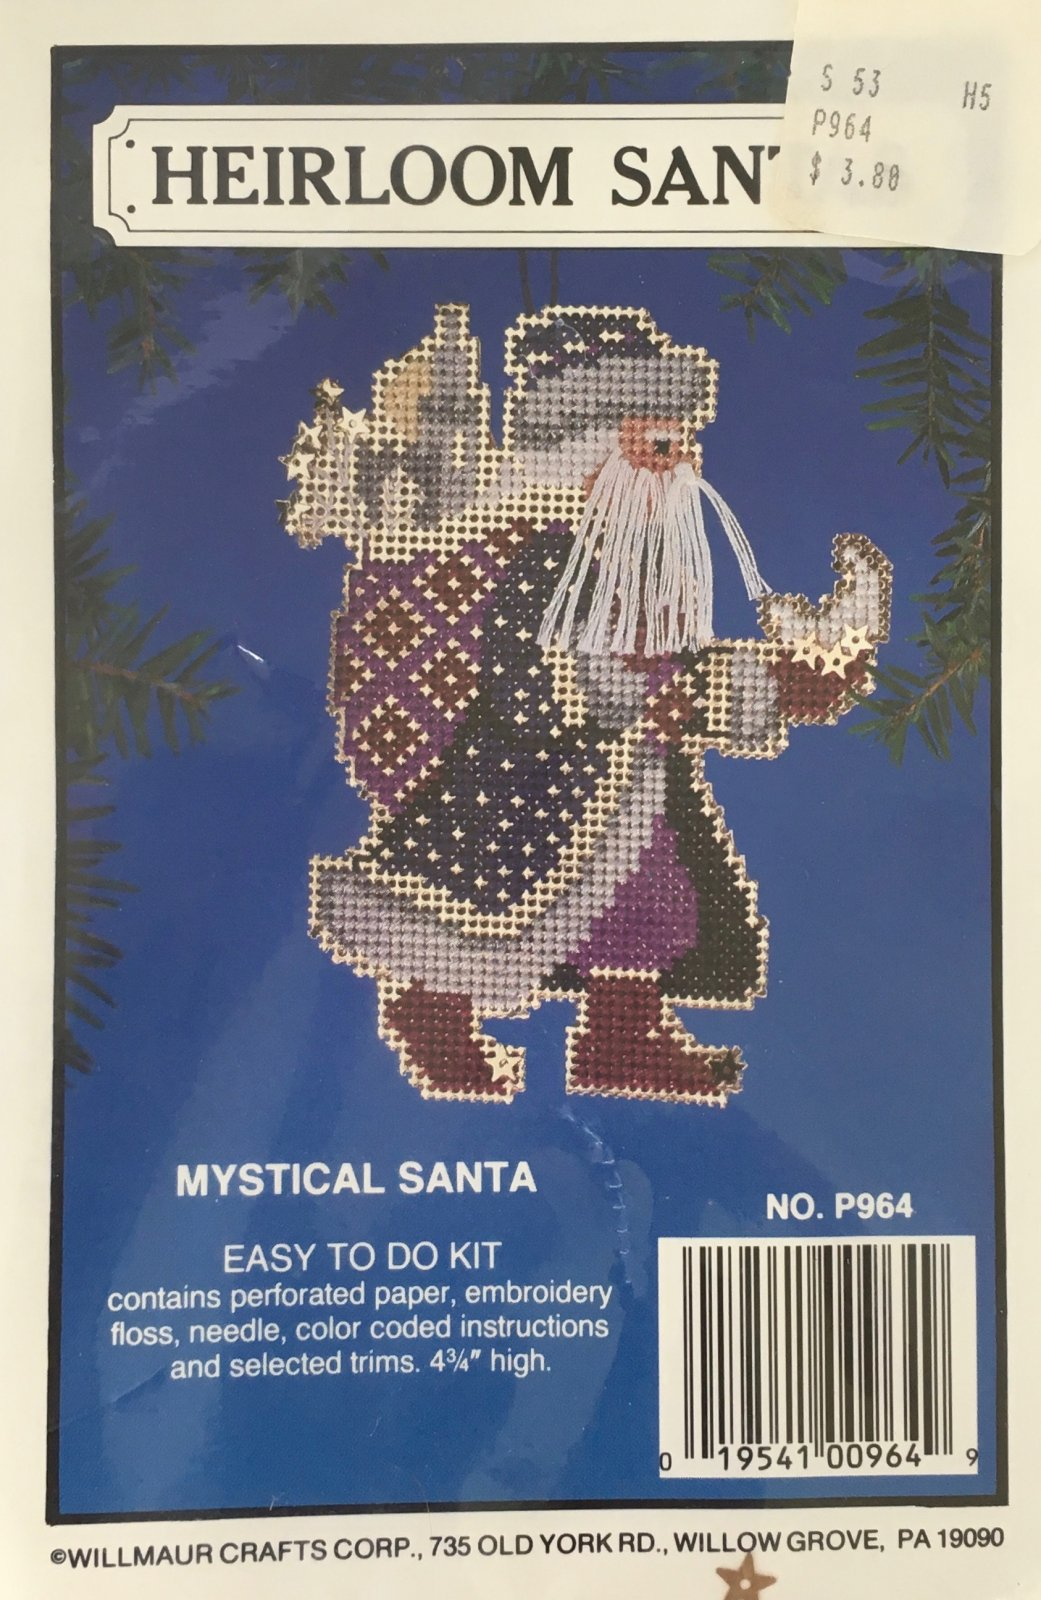 Astor Place: Heirloom Santas Mystical Santa Kit P964